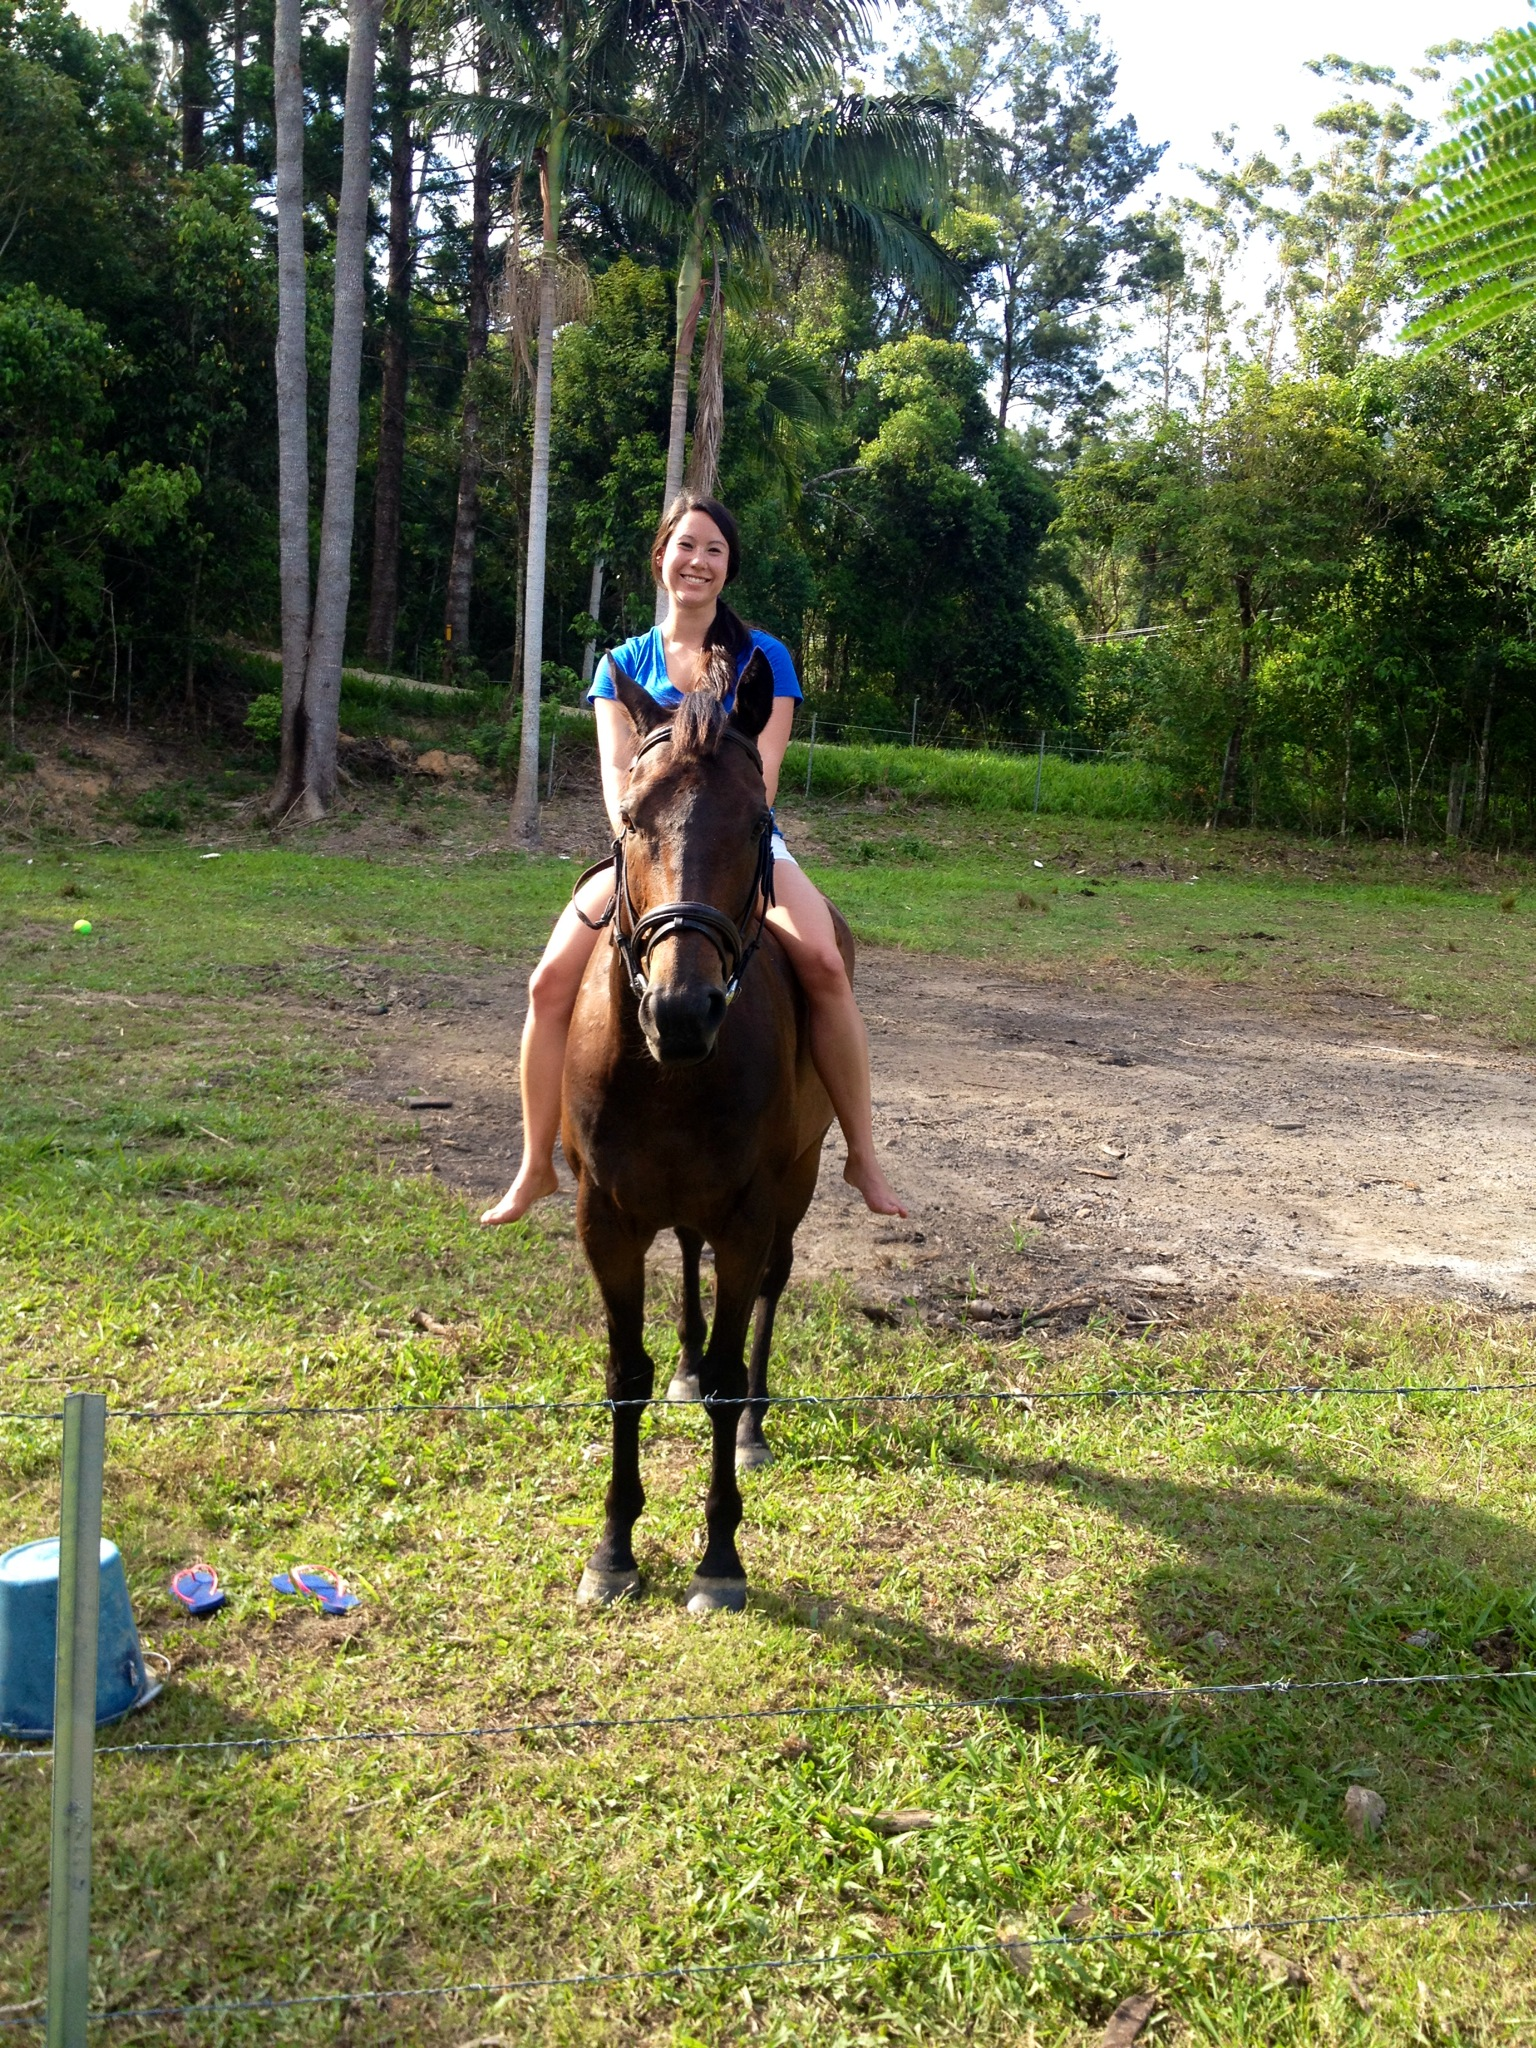 Photo 4 3 for Where to go horseback riding near me